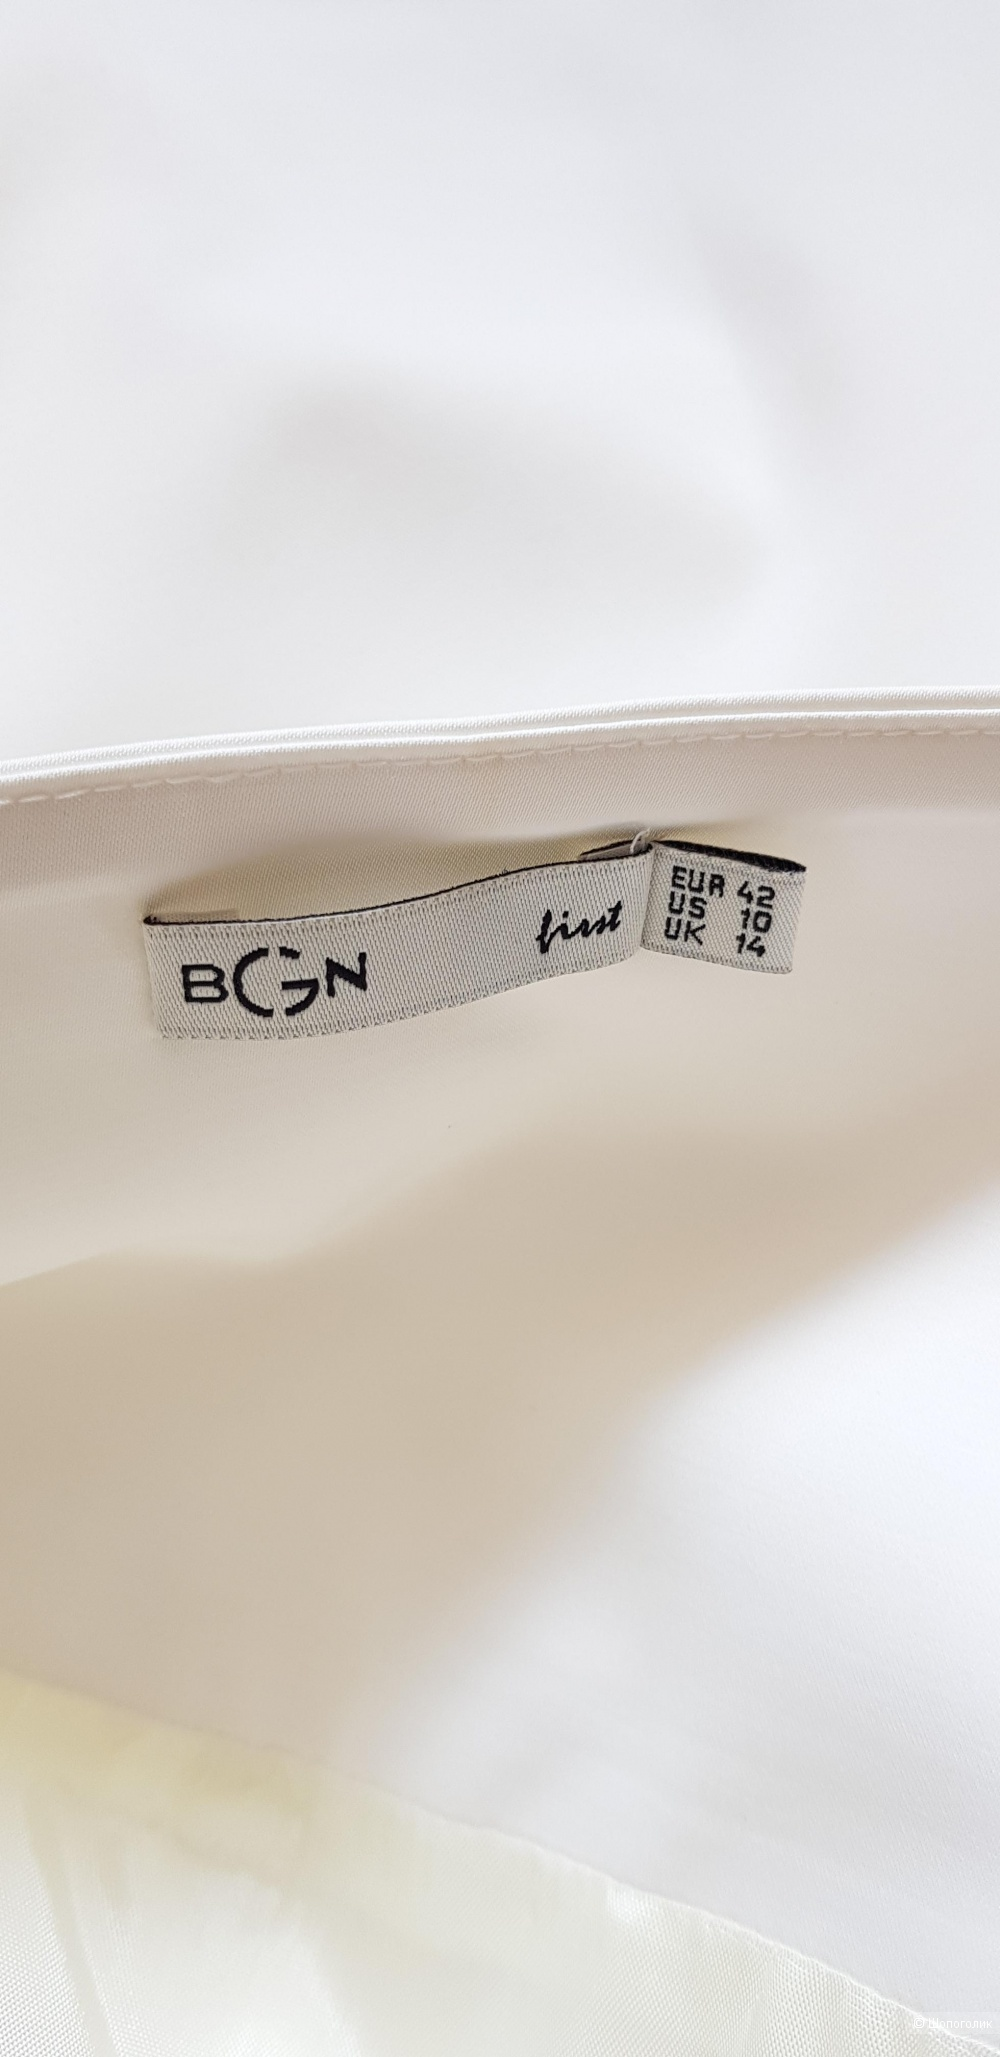 Юбка BGN 48